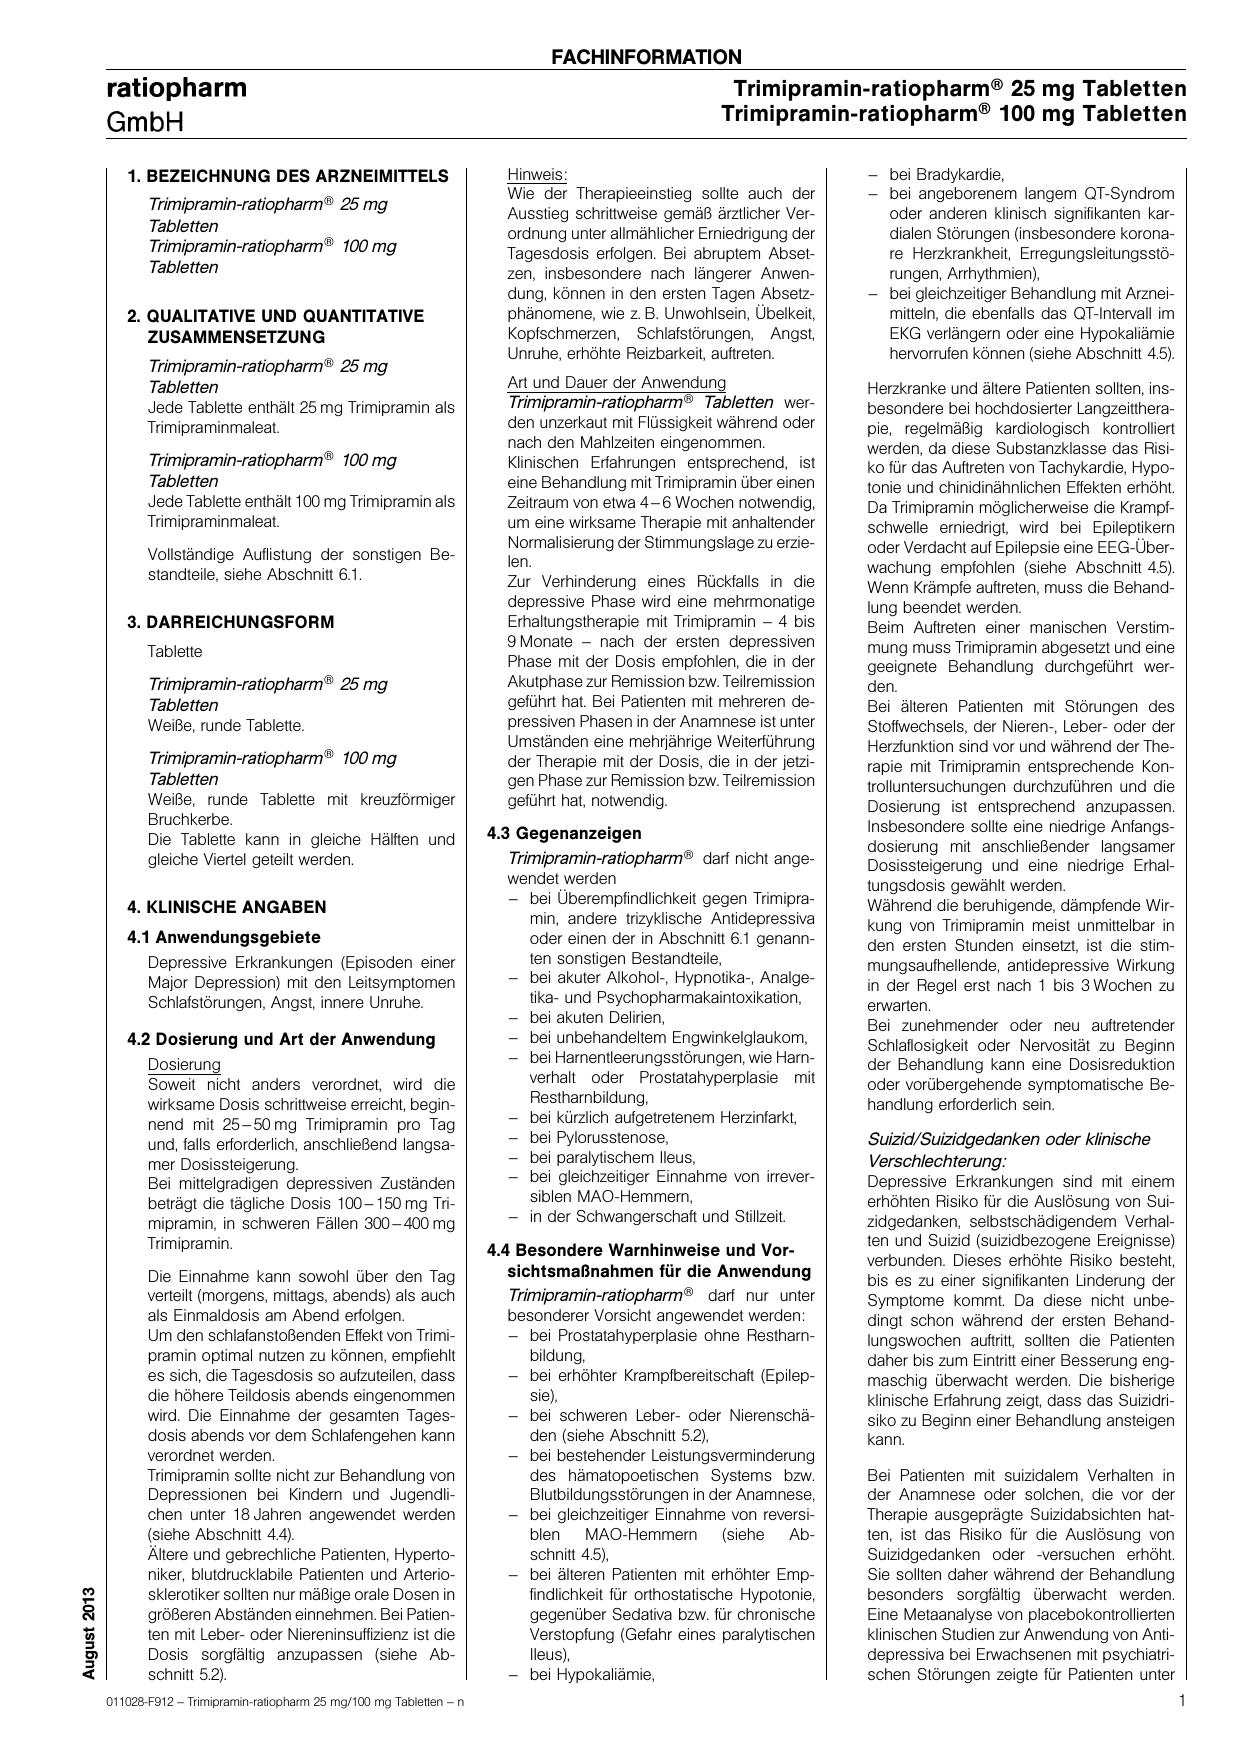 Trimipramin-ratiopharm® 25 mg Tabletten Trimipramin